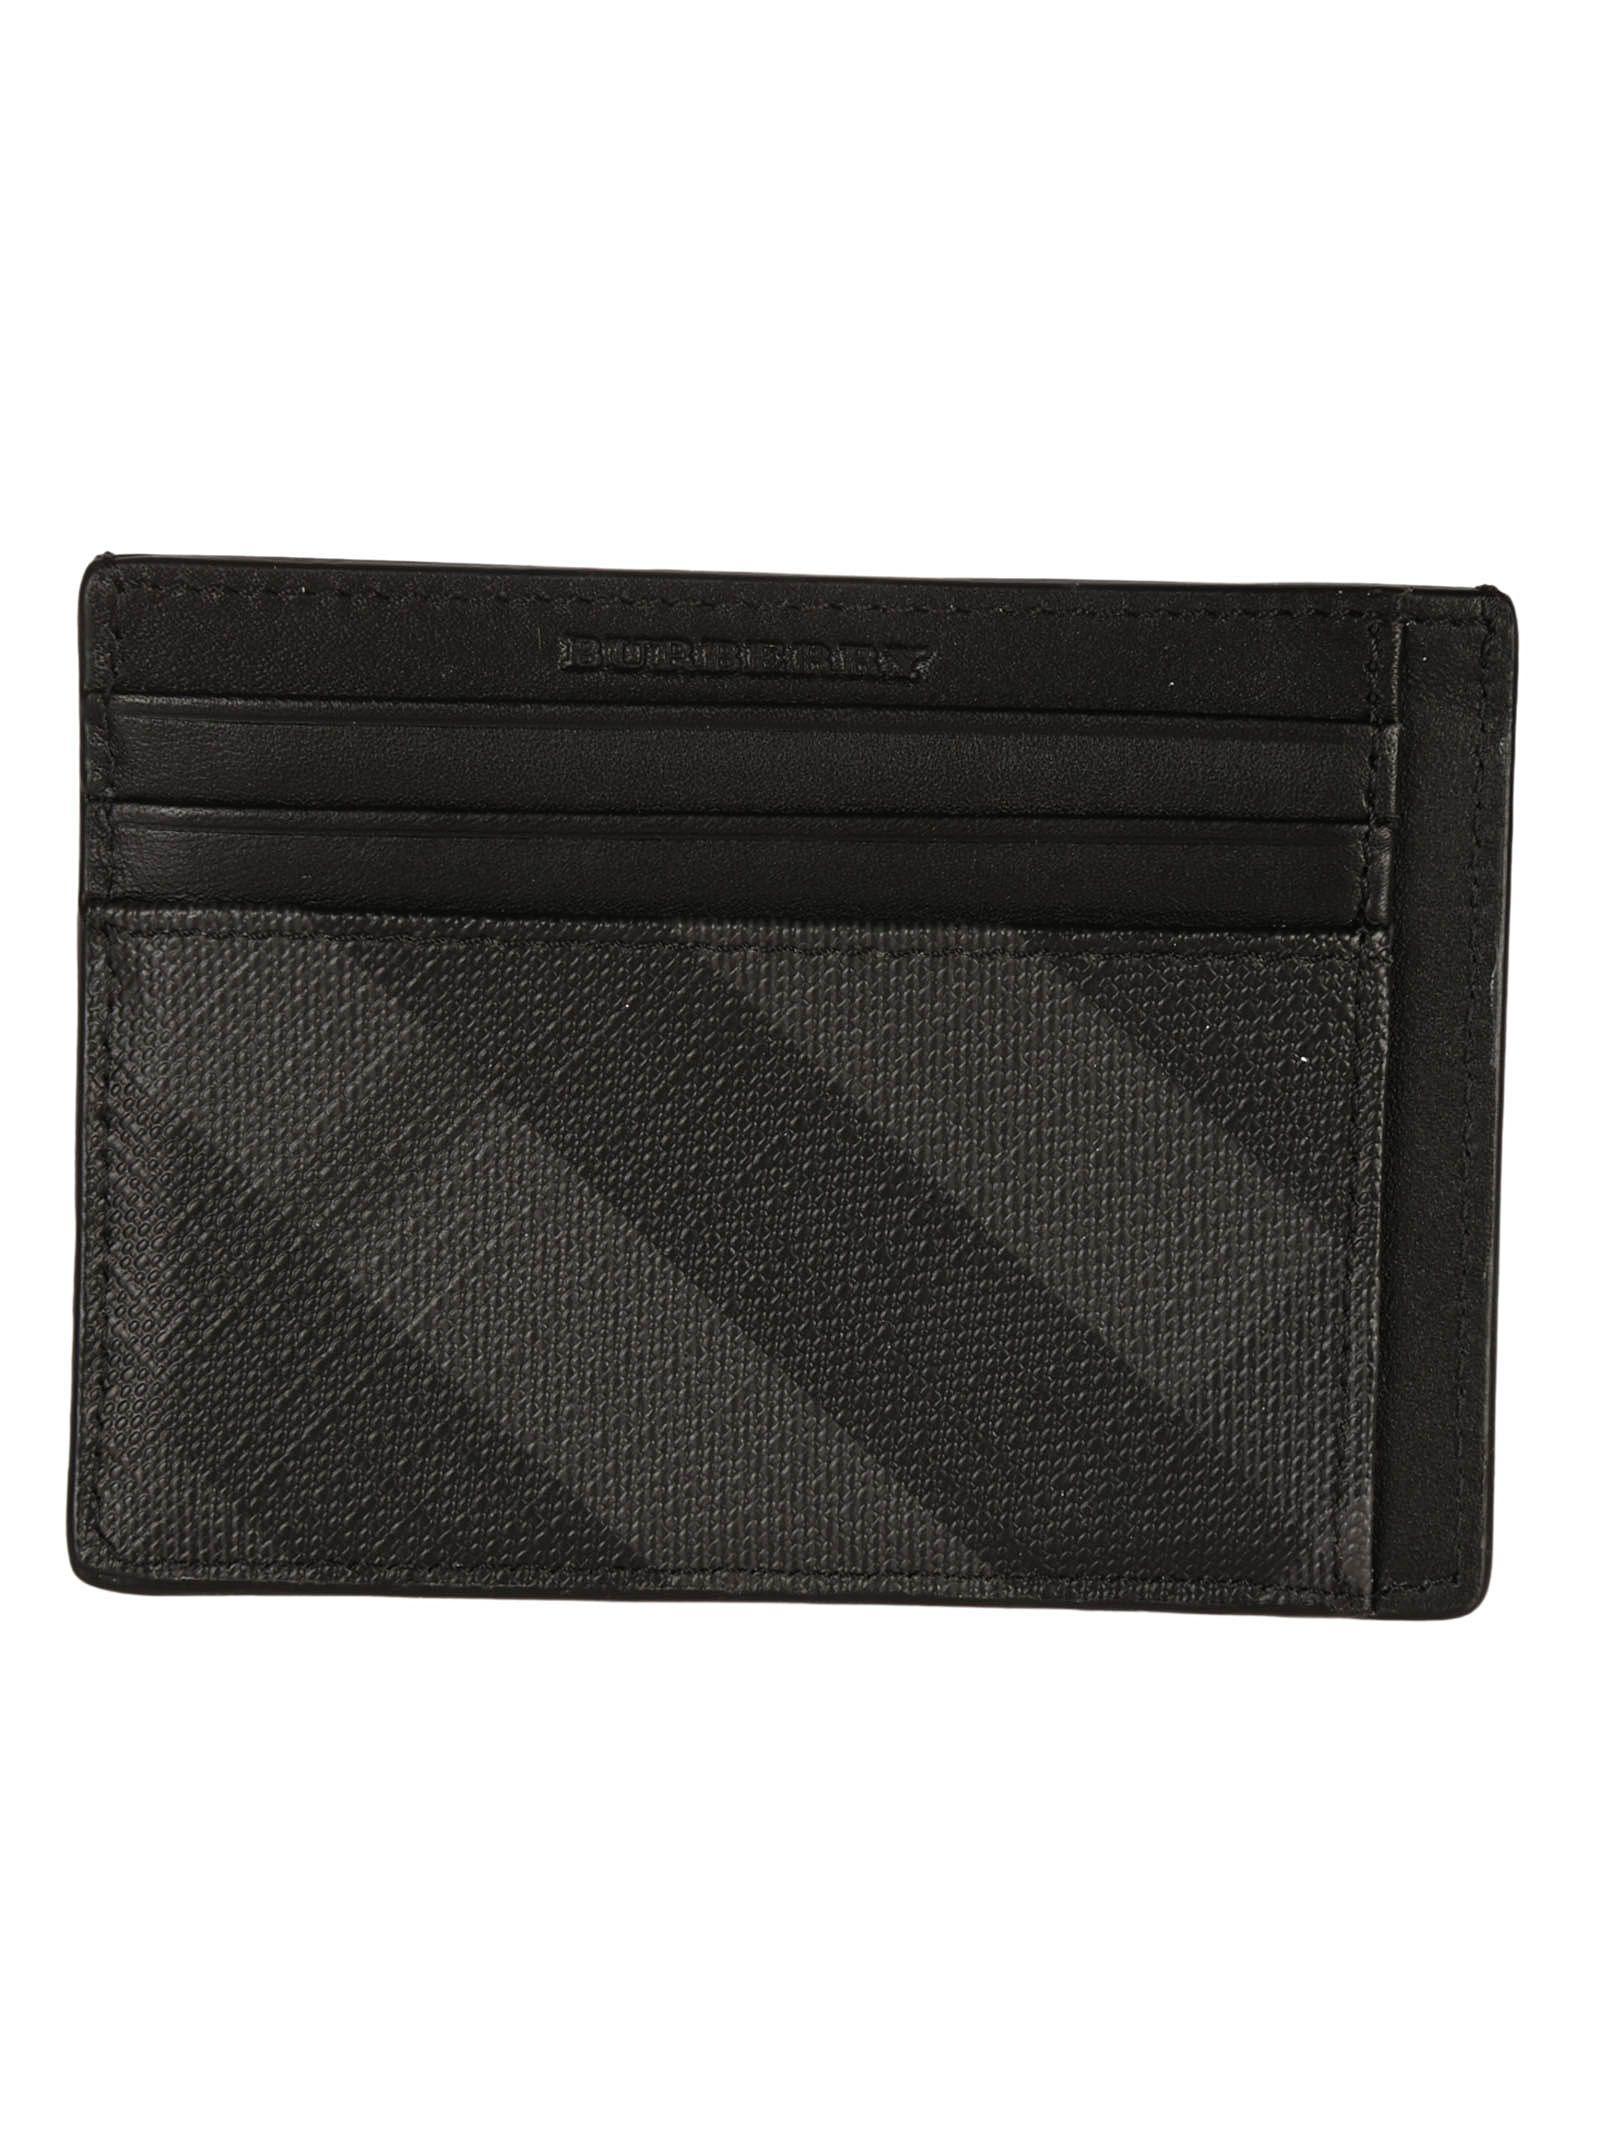 Burberry Card Holder Wallet